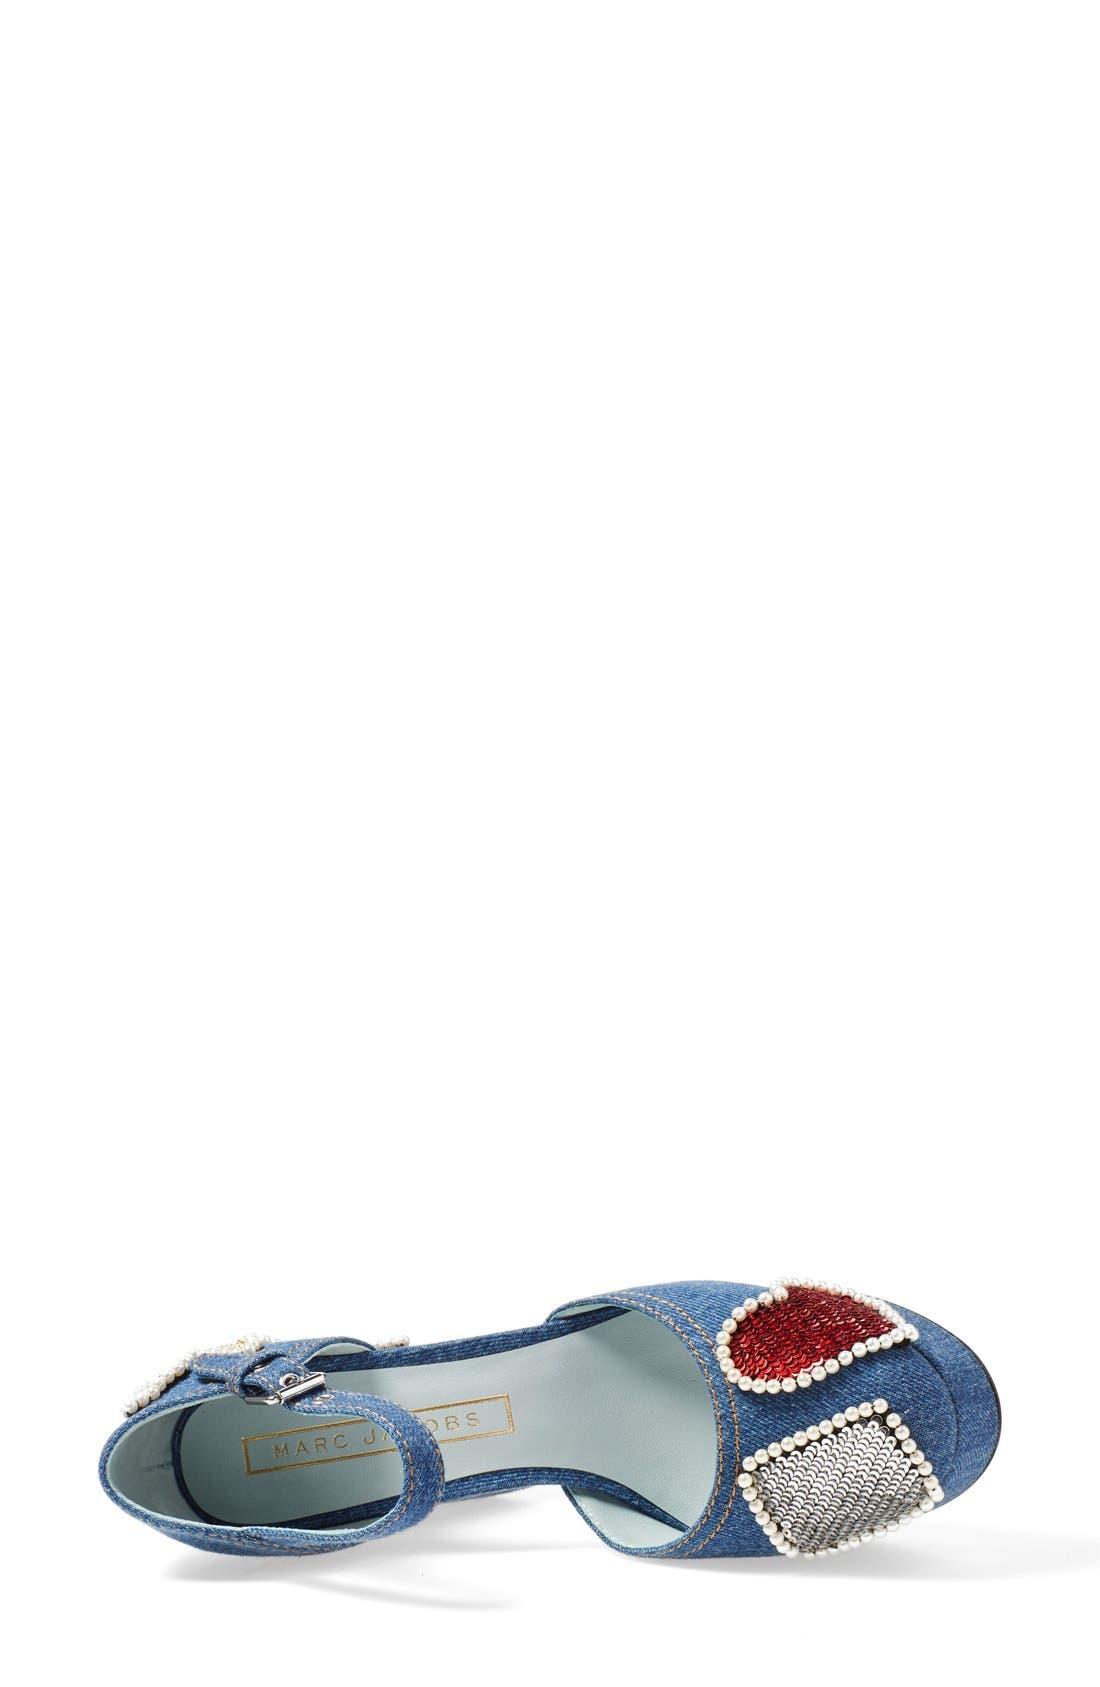 'American' Ankle Strap Platform Pump,                             Alternate thumbnail 3, color,                             Denim